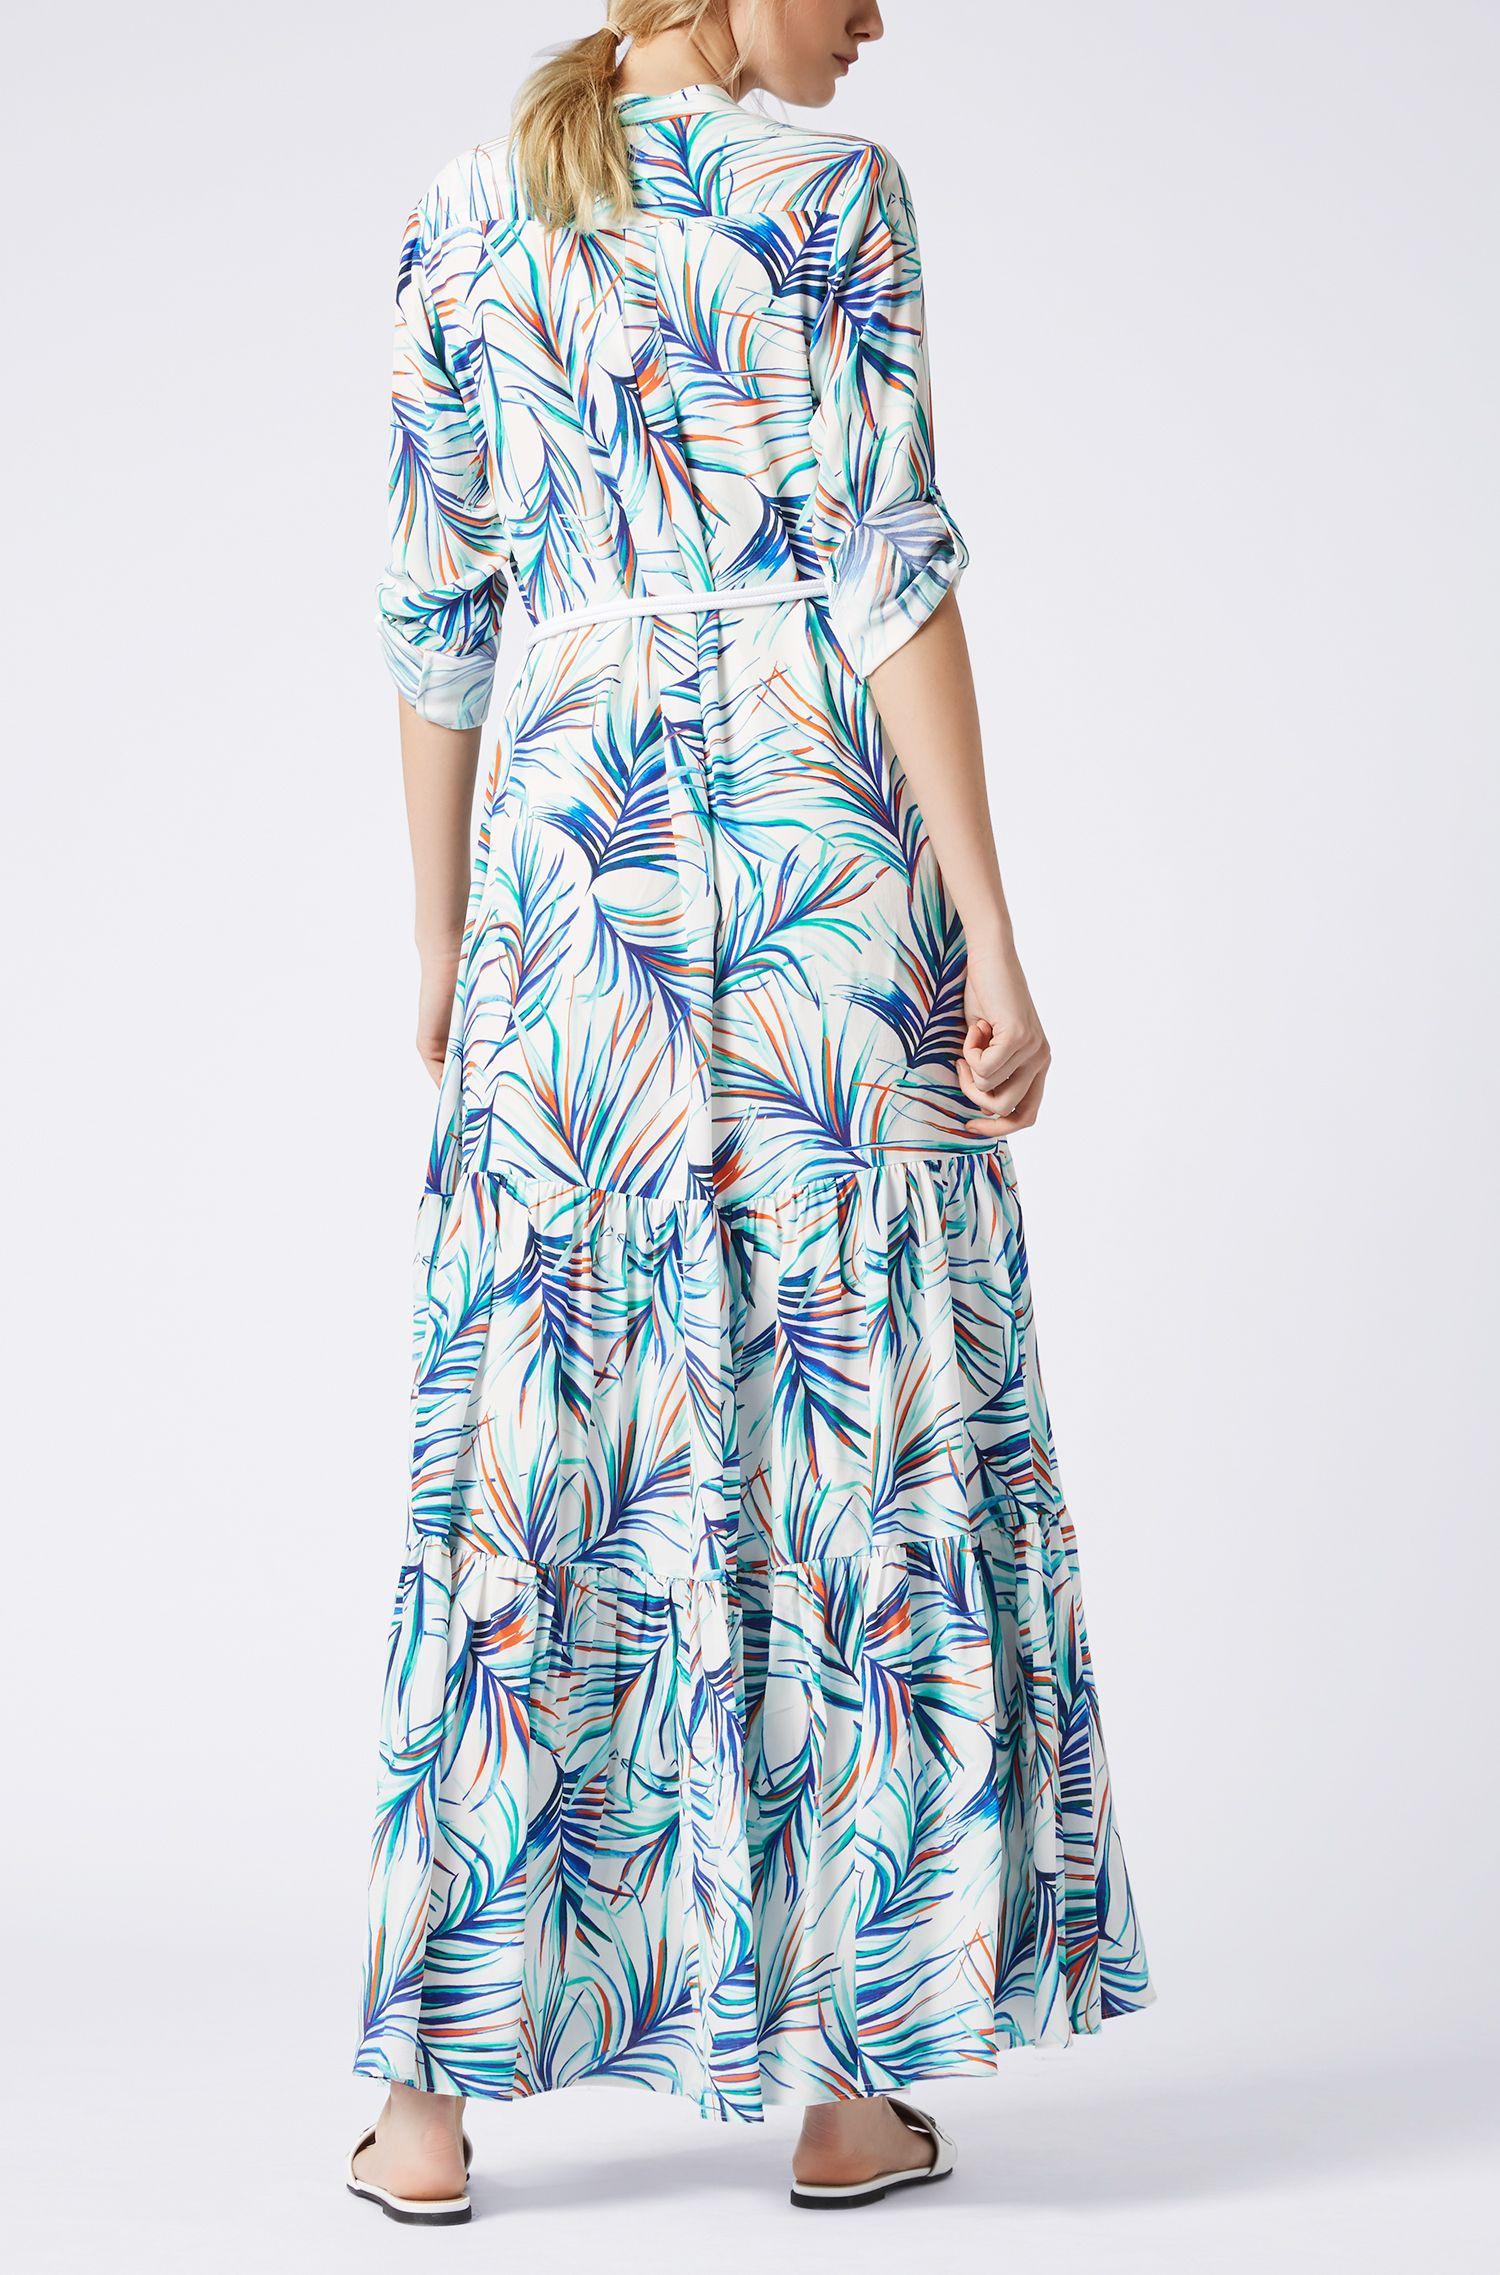 Long-sleeved silk maxi dress in palm-leaf print